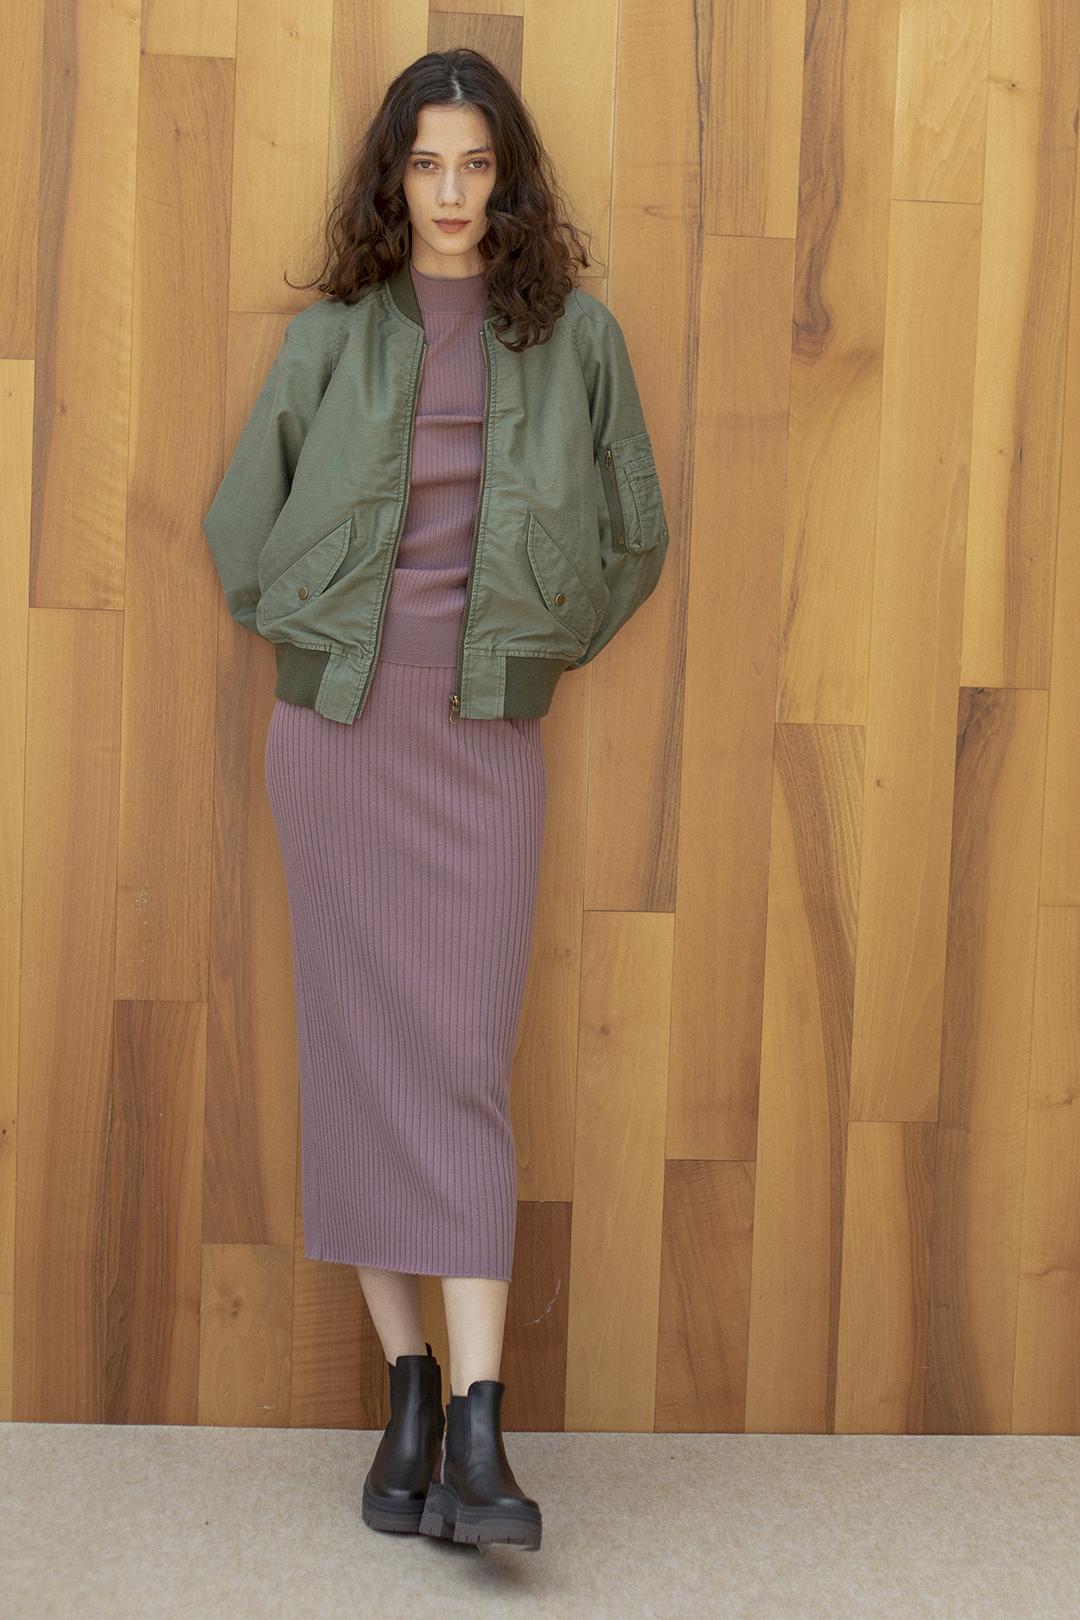 18_2 jacket¥53,900  knit¥25,300  skirt¥25,300  shoes¥64,900